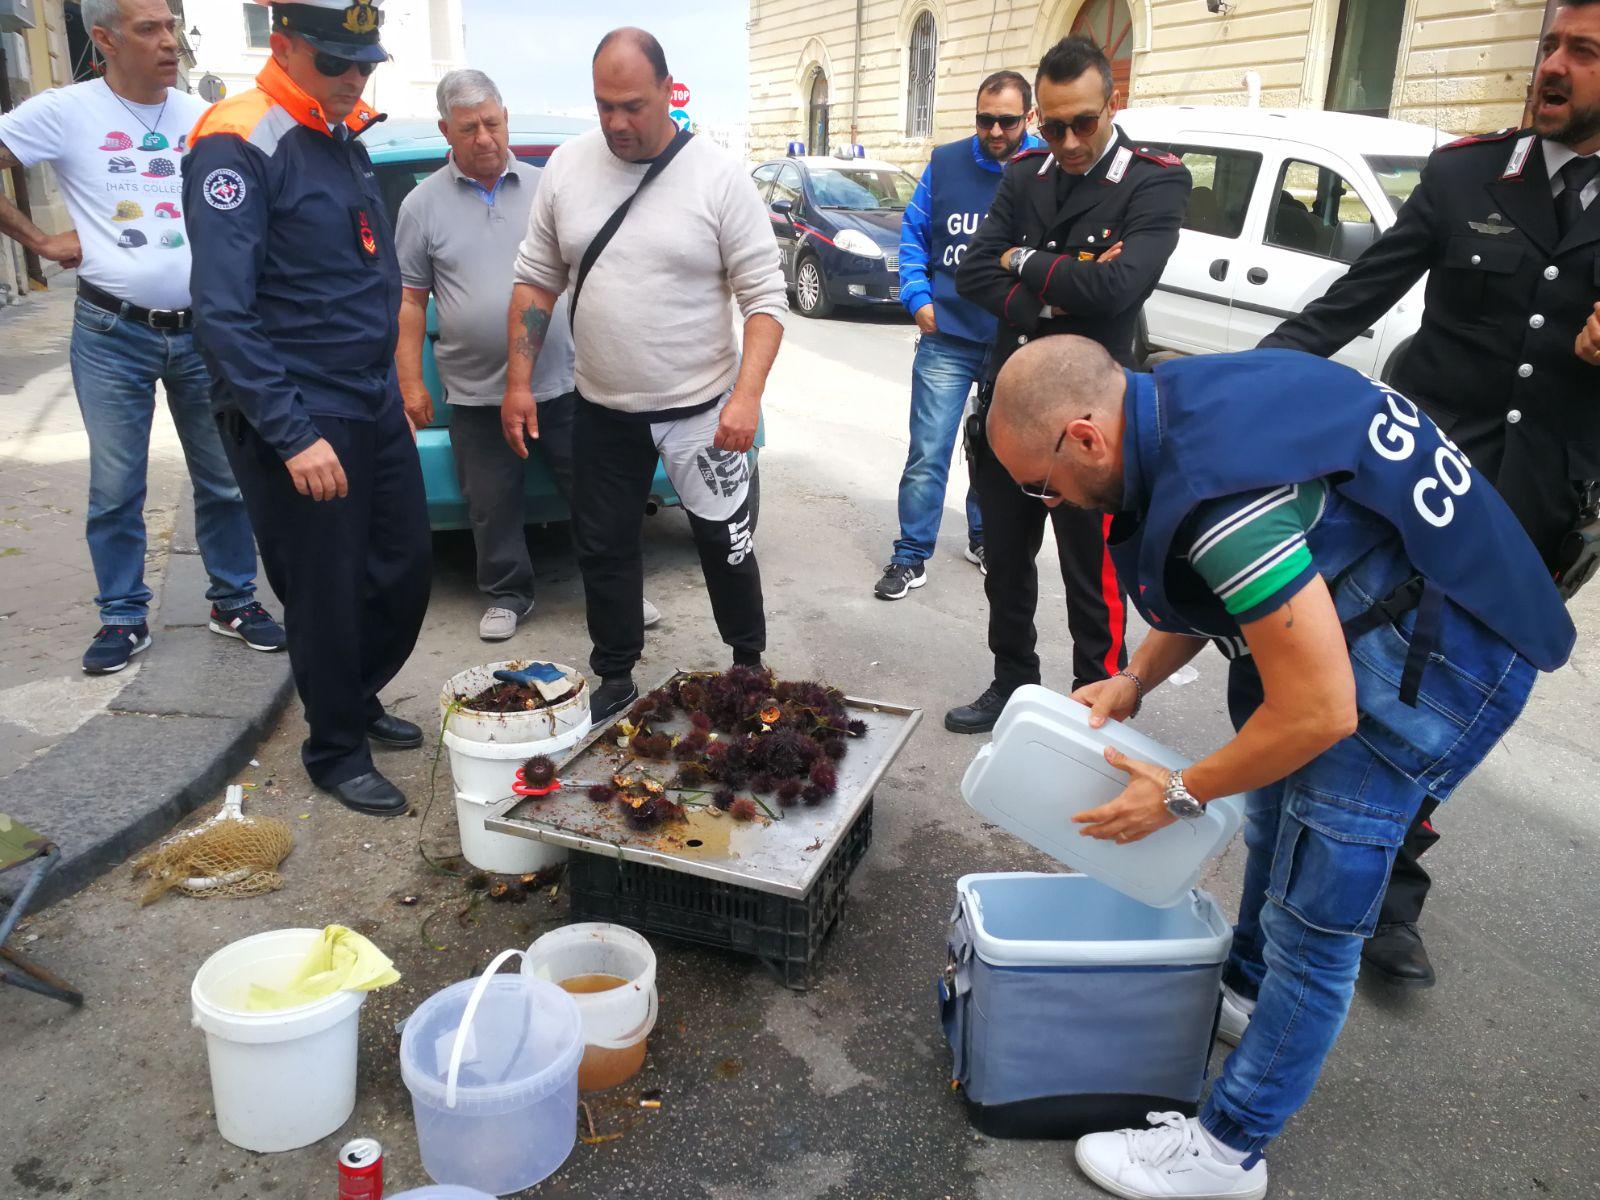 Siracusa, ancora venditore abusivi di ricci di mare: multe salatissime